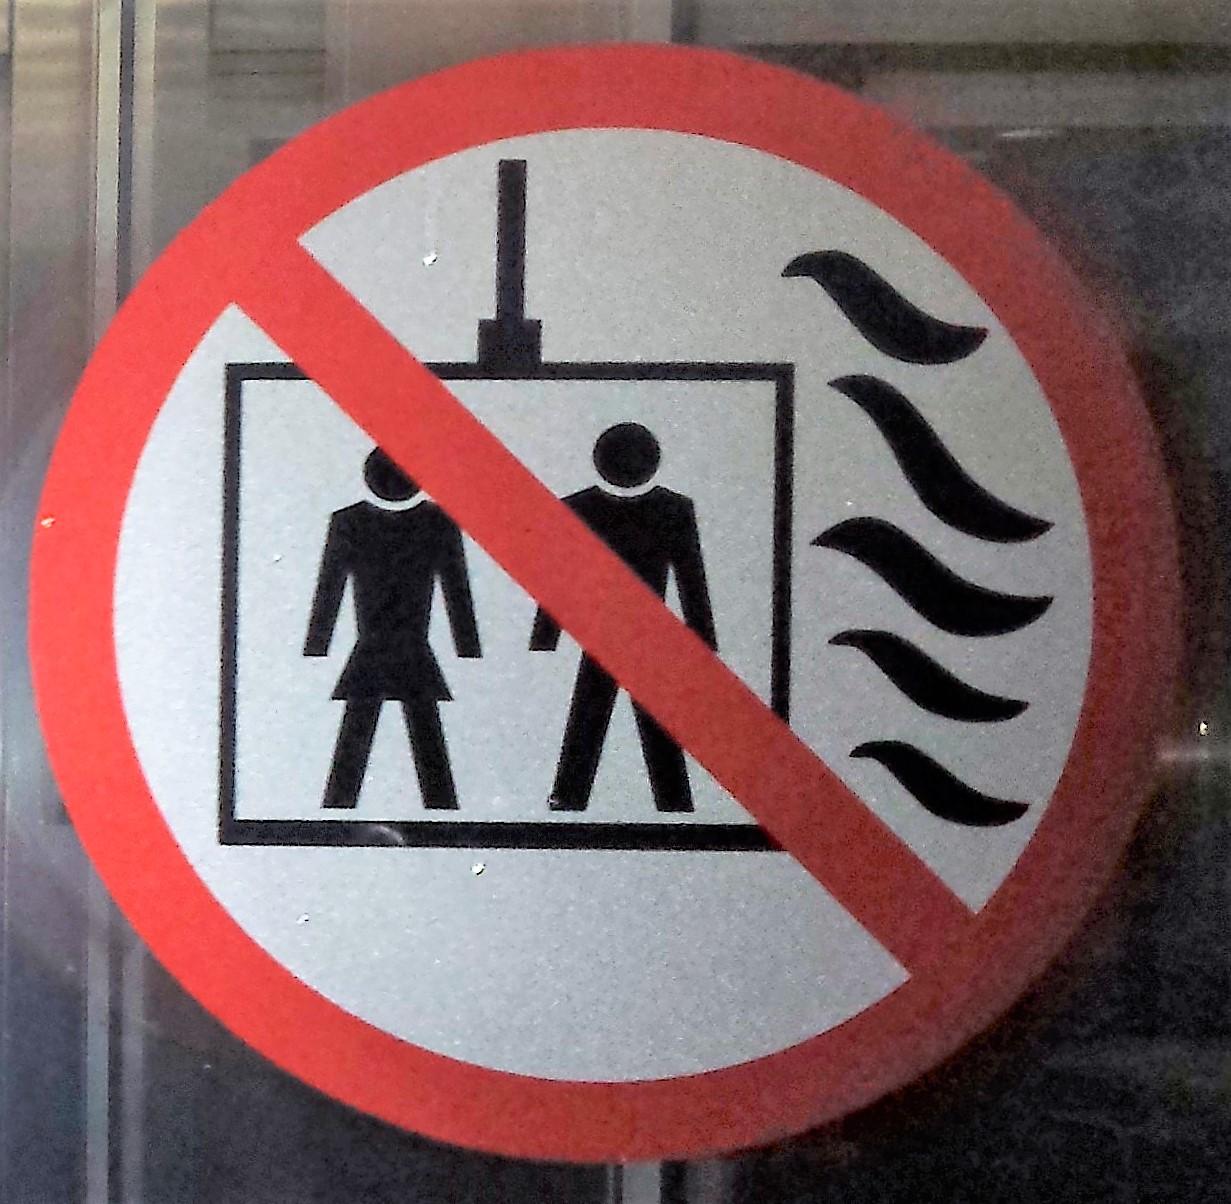 dejtingsajt varnings skyltar dejtingsajt San Jose